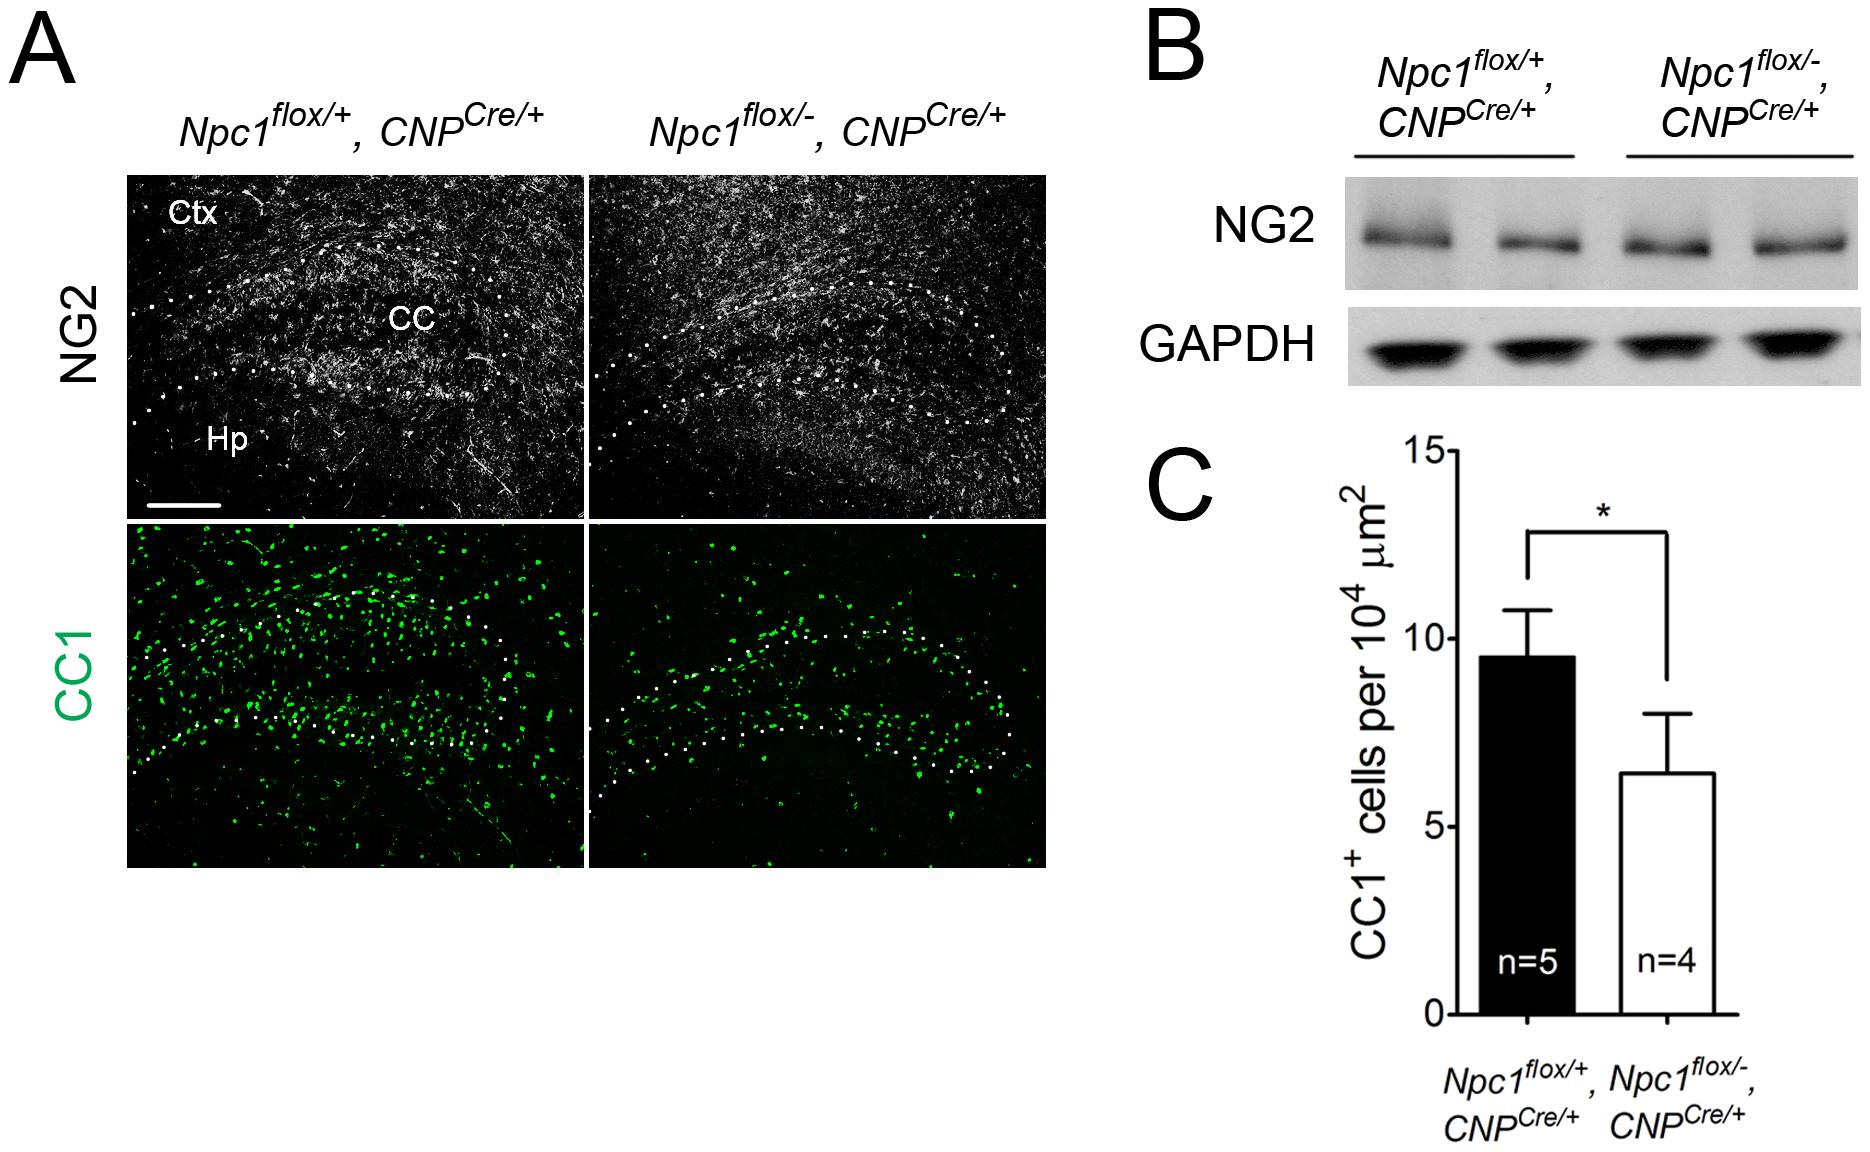 Oligodendrocyte-specific deletion of <i>Npc1</i> leads to blockade of oligodendrocyte maturation.